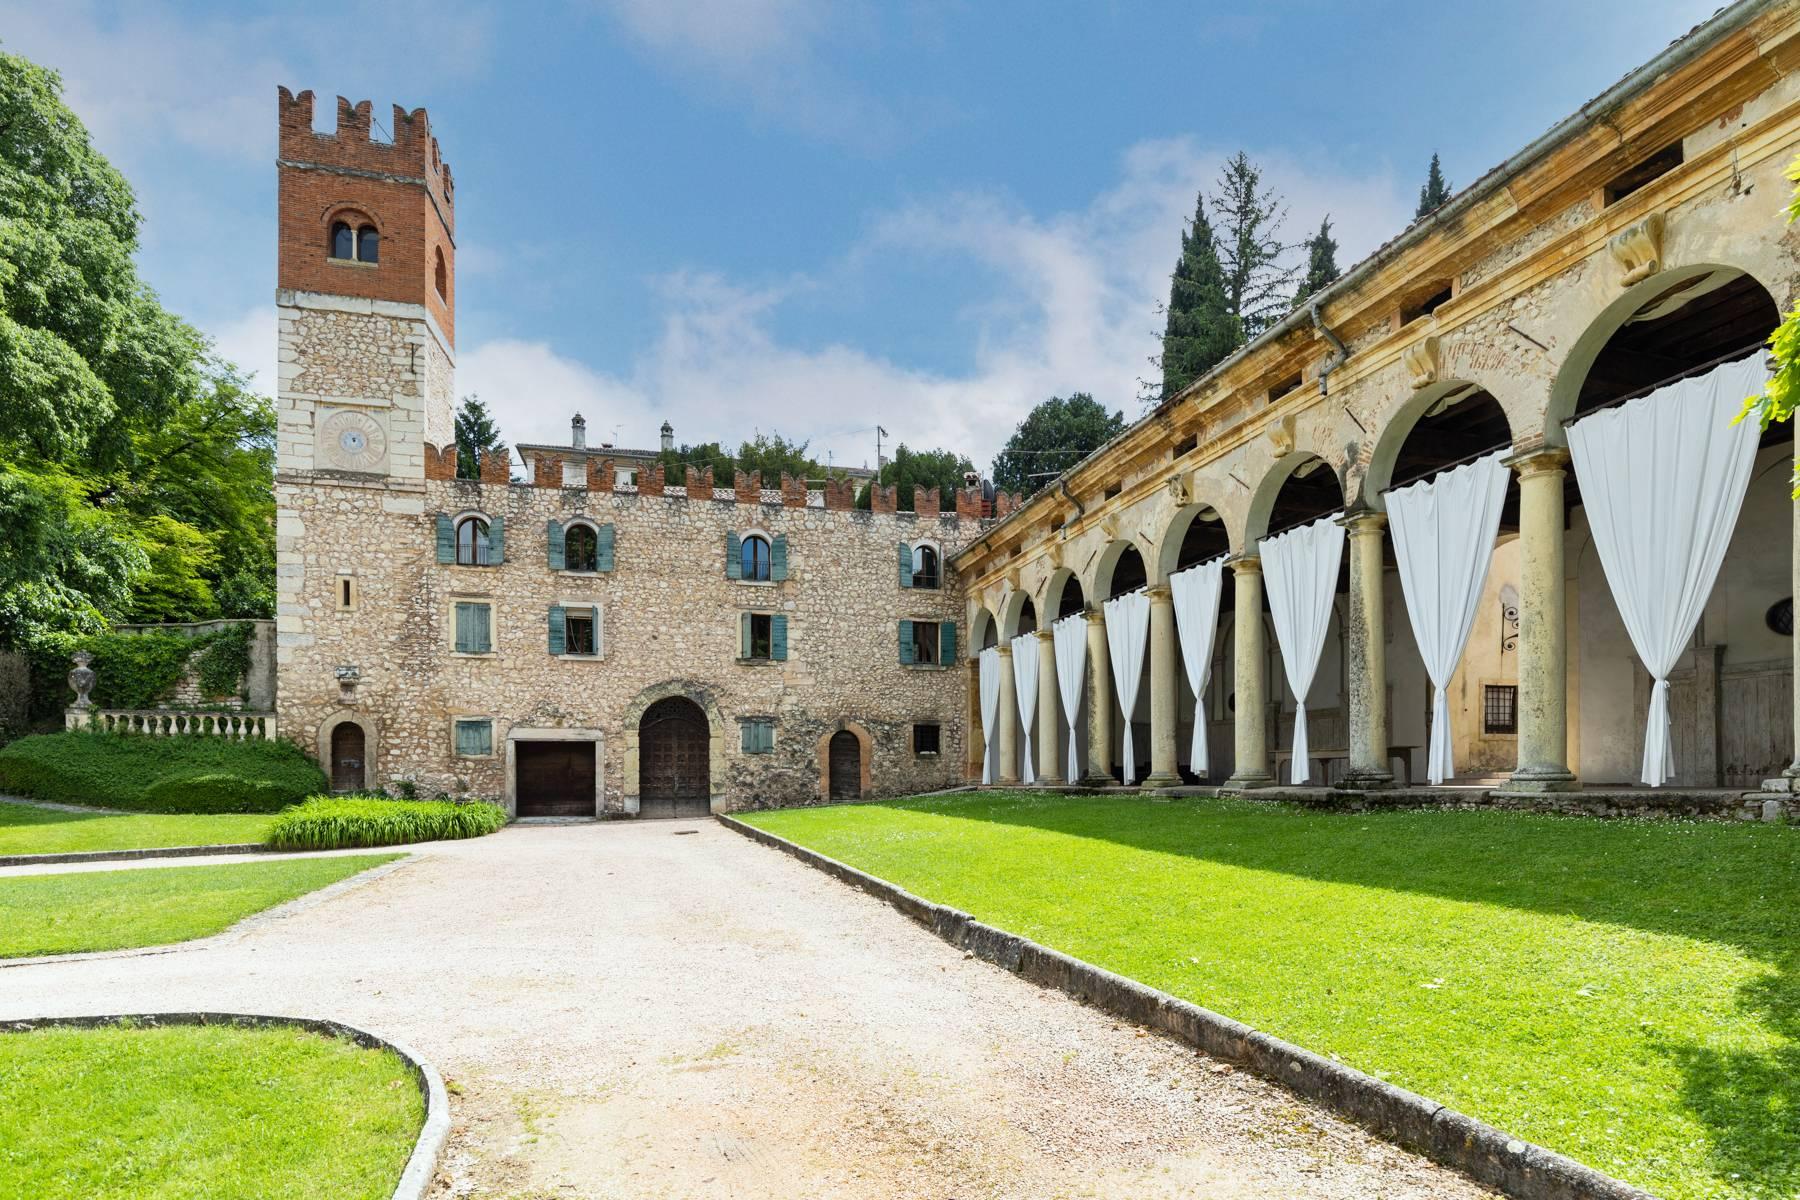 Villa in Vendita a Verona: 5 locali, 2400 mq - Foto 7